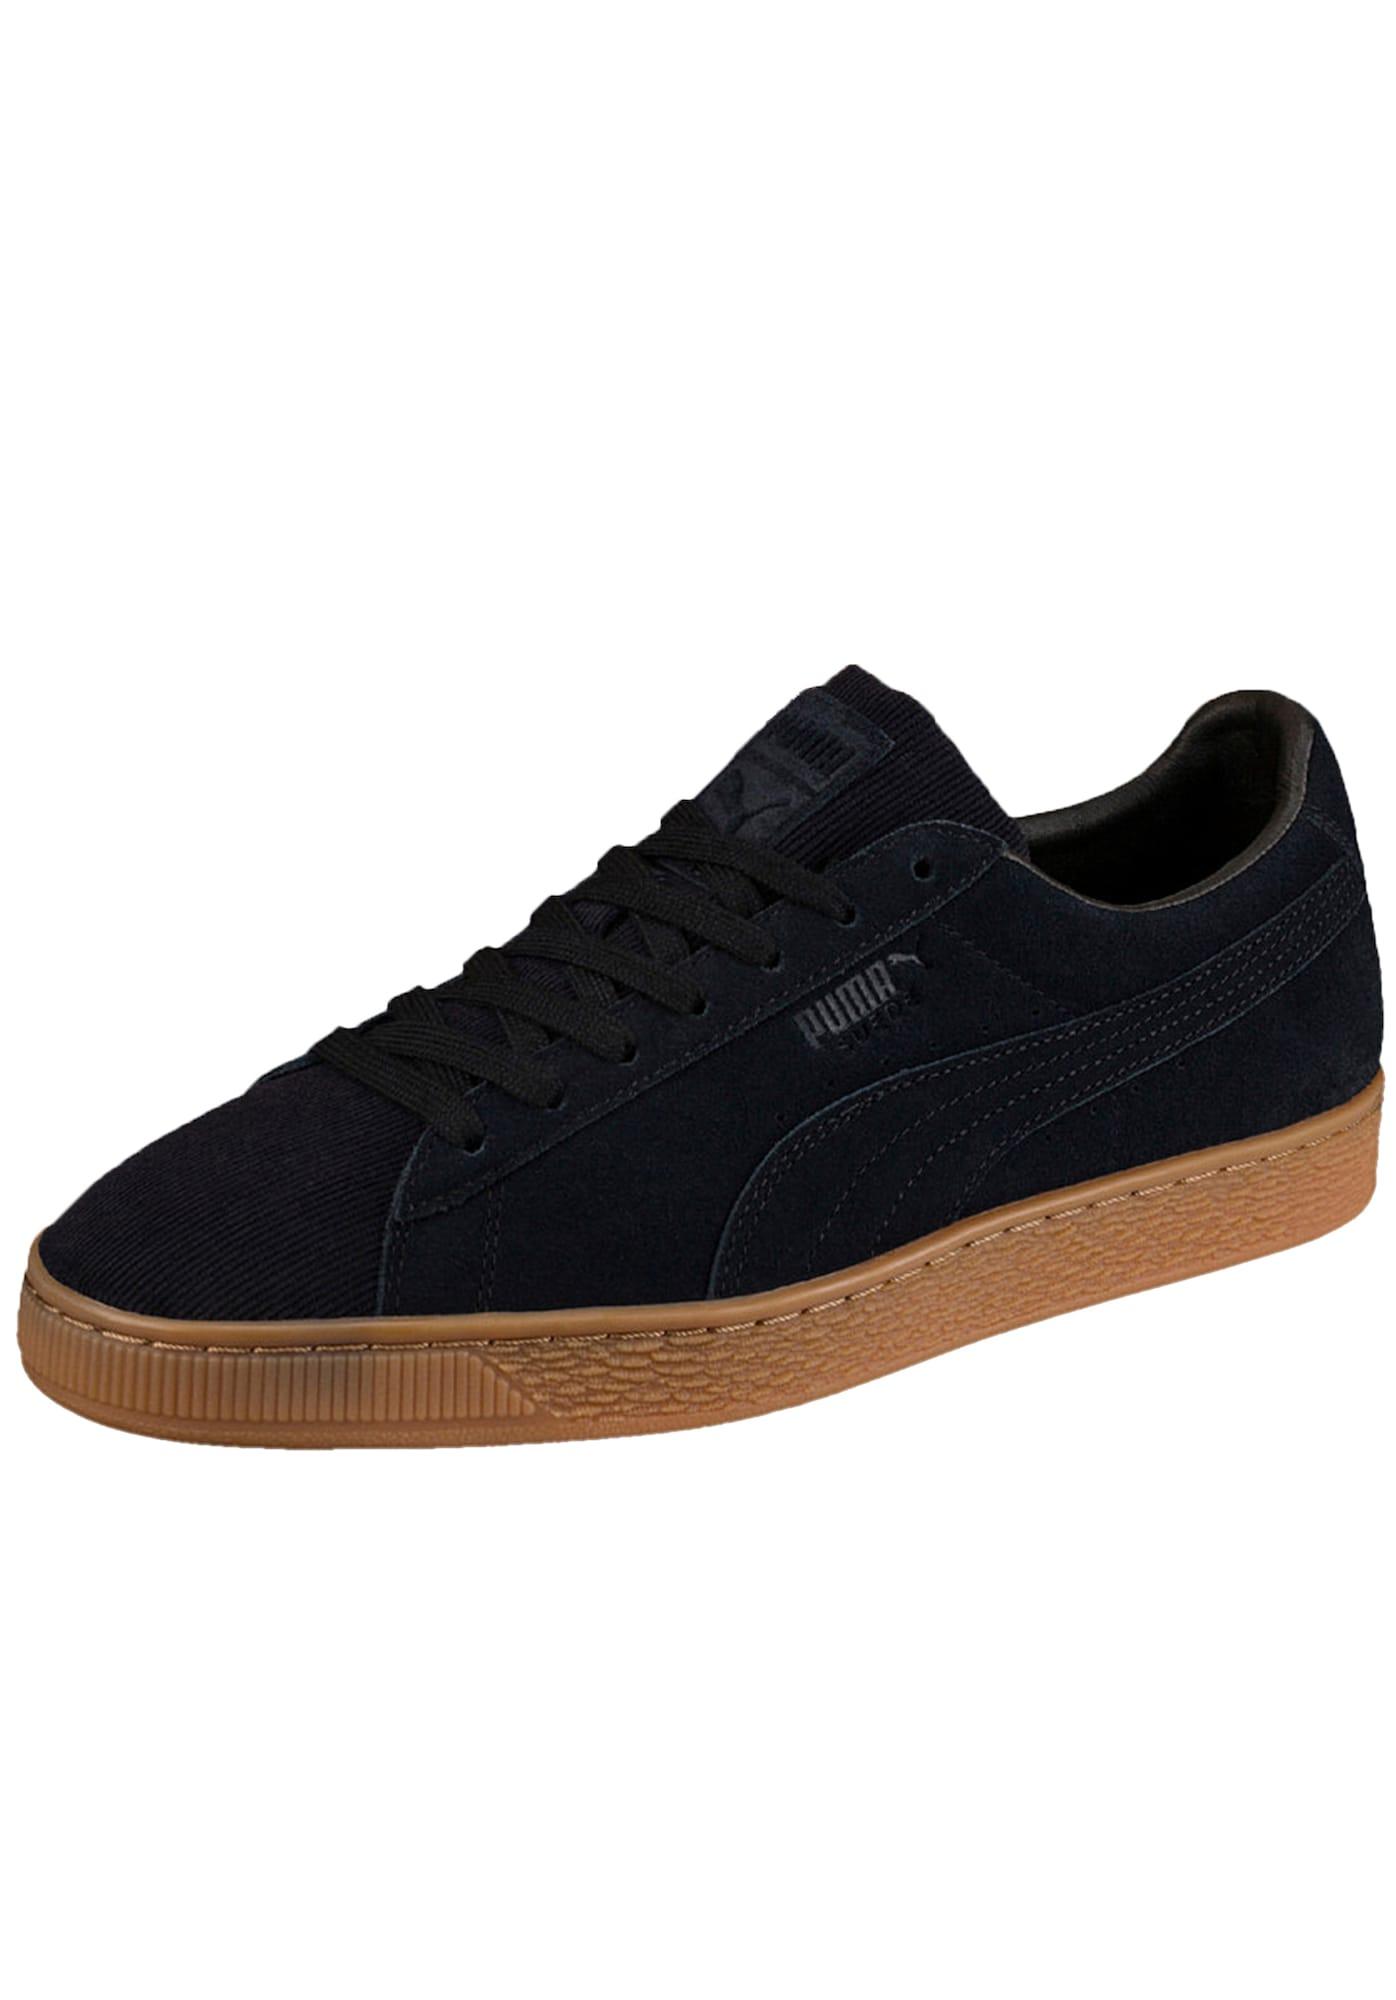 5336b2dd0d0 puma Puma Heren Sneakers Laag Suede Classic Pincord Zwart puma kopen in de  aanbieding